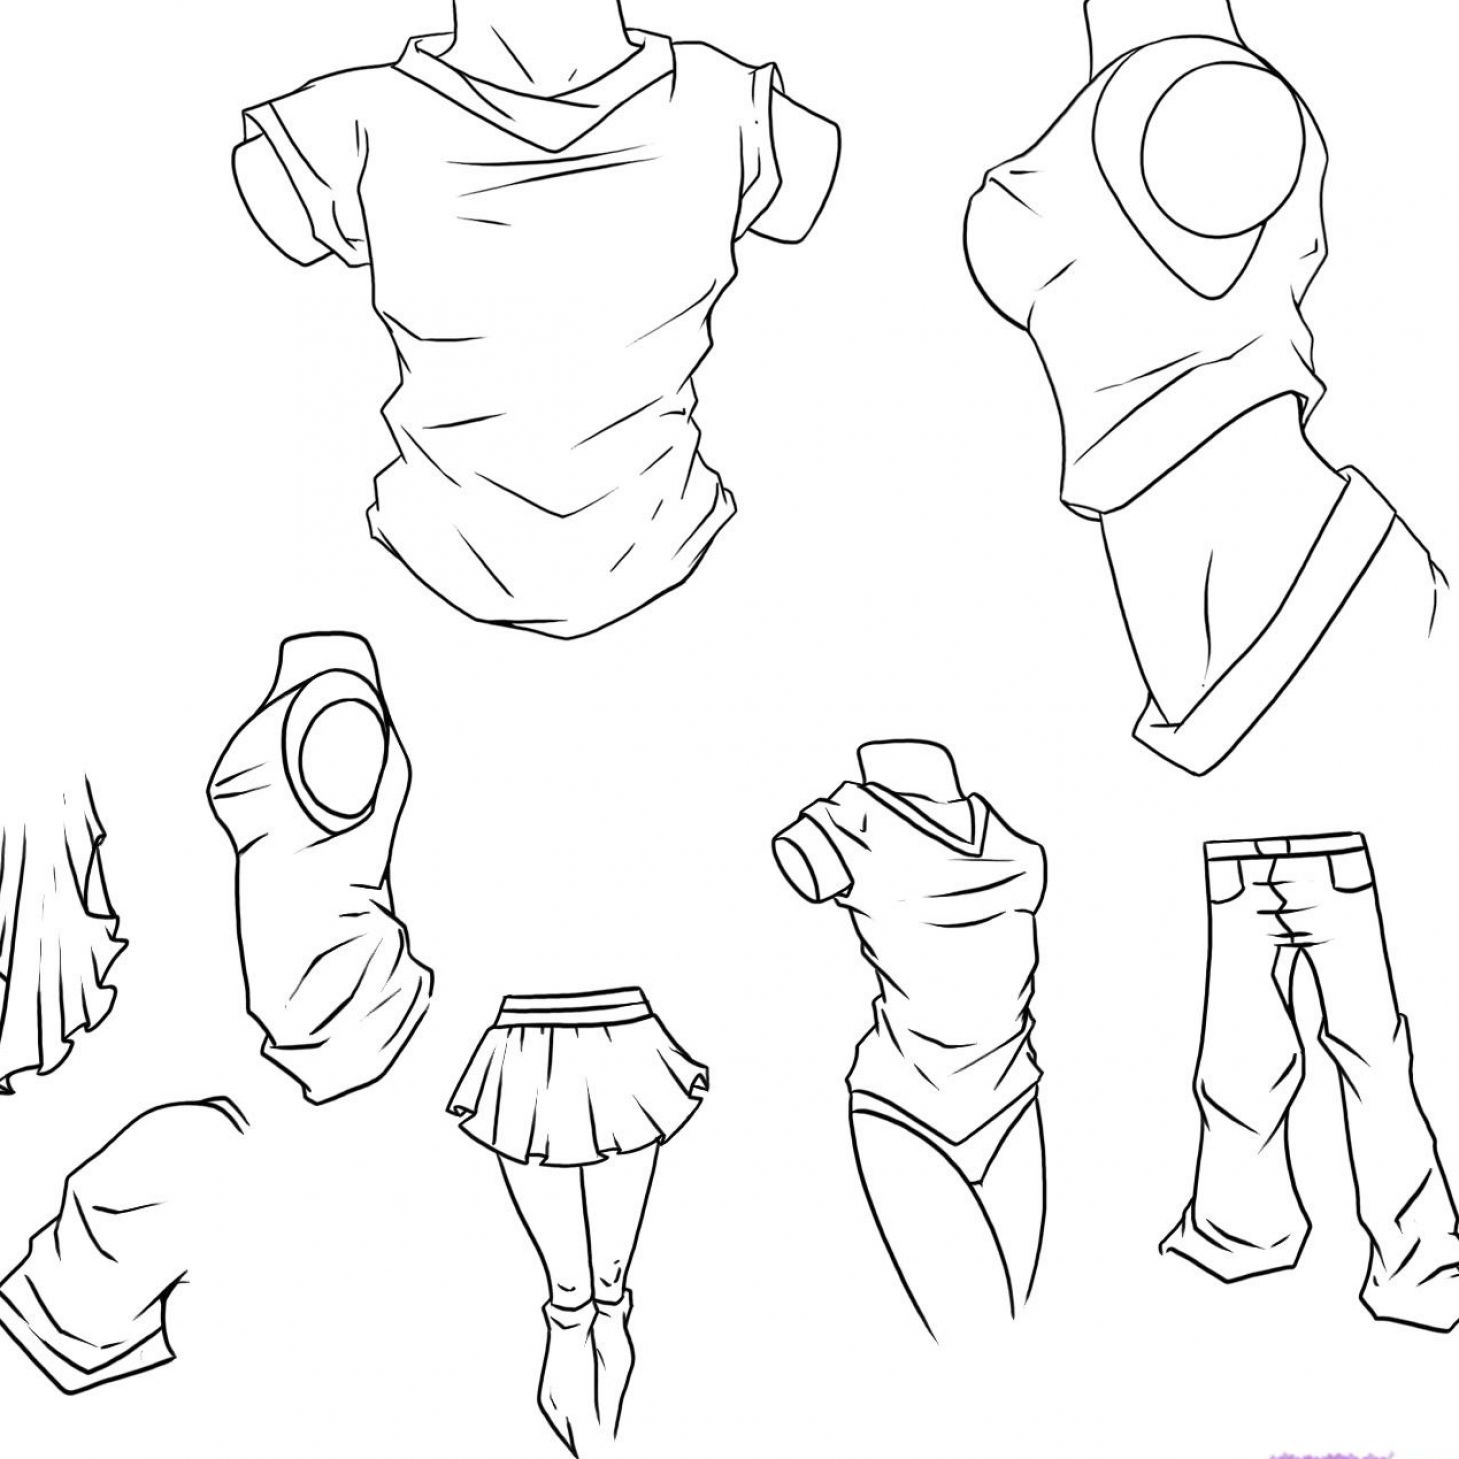 1459x1459 Drawn Comics Anime